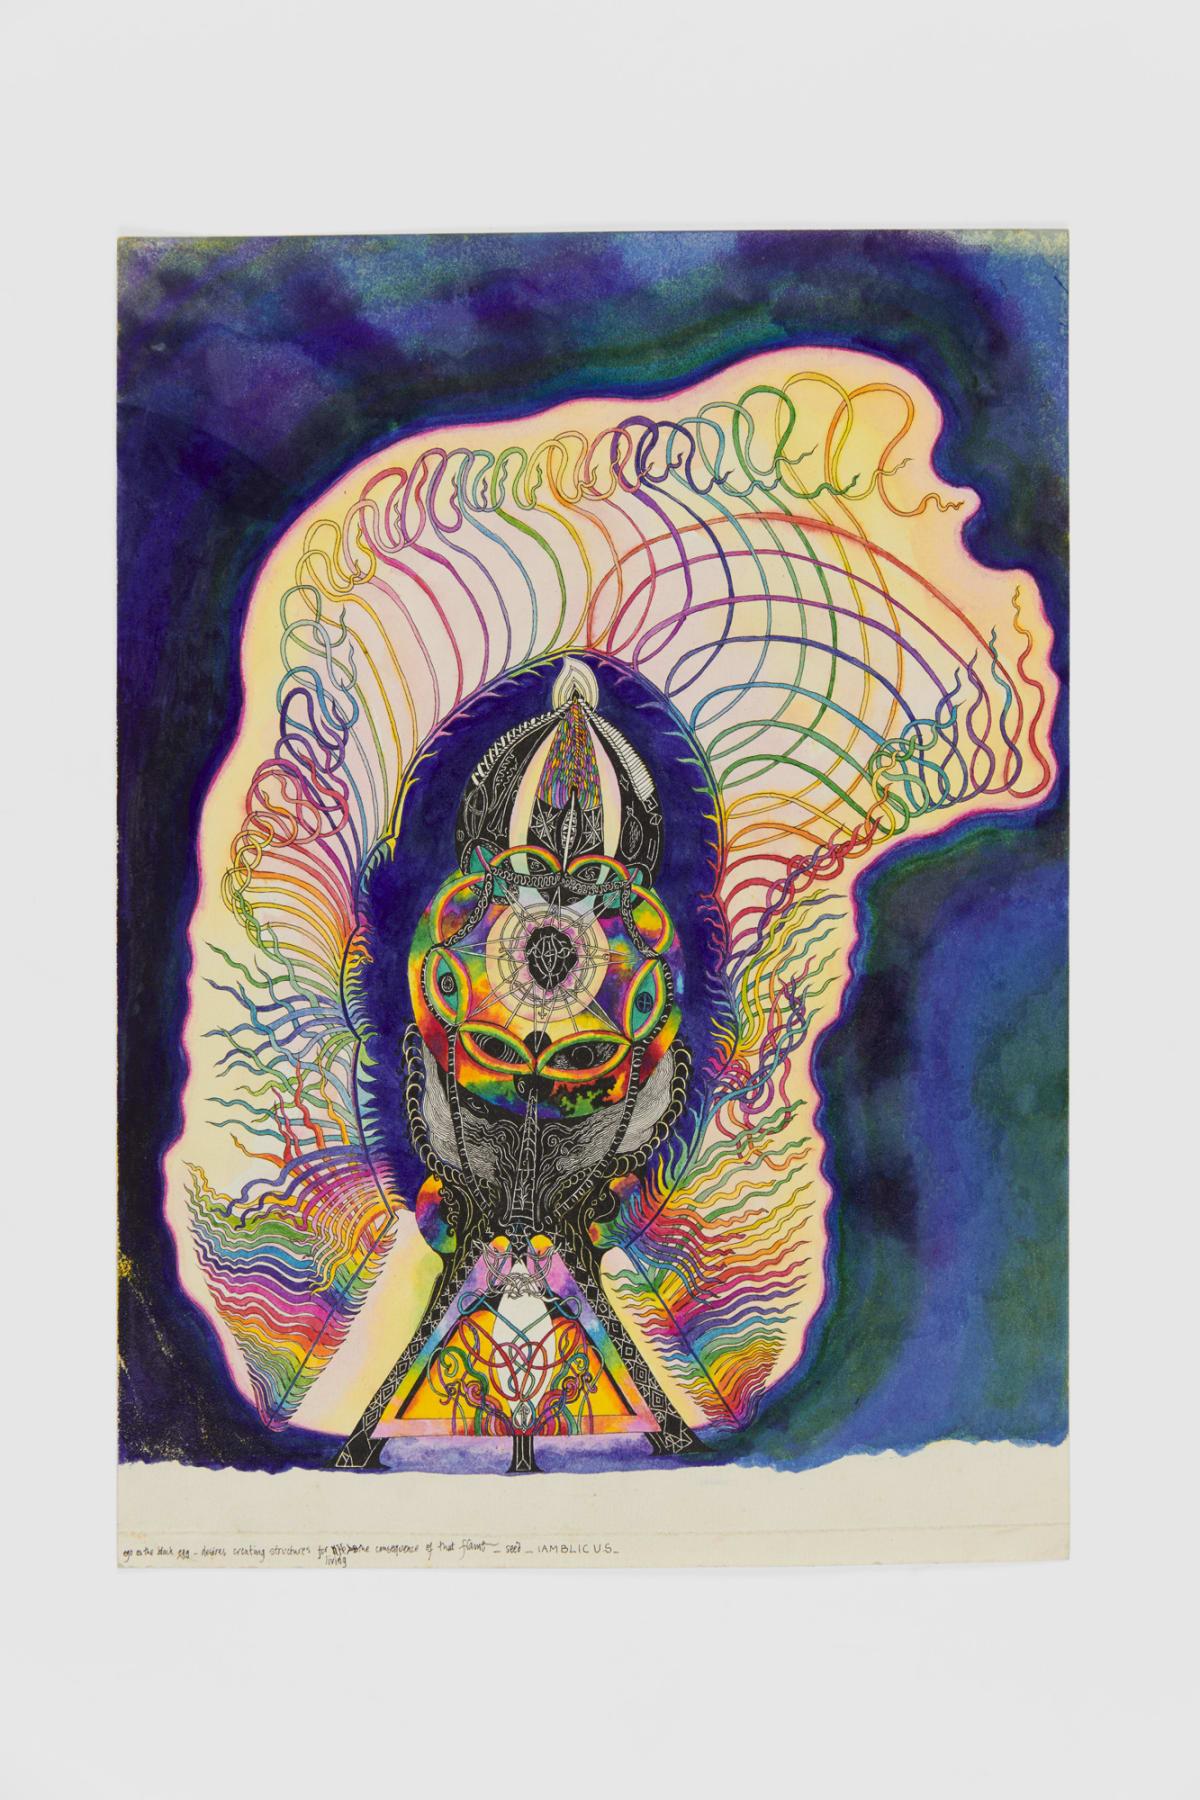 Ann CHURCHILL Coloured drawing (IAMBLICUS), 1978 Ink on paper 20.9 x 29.7 cm